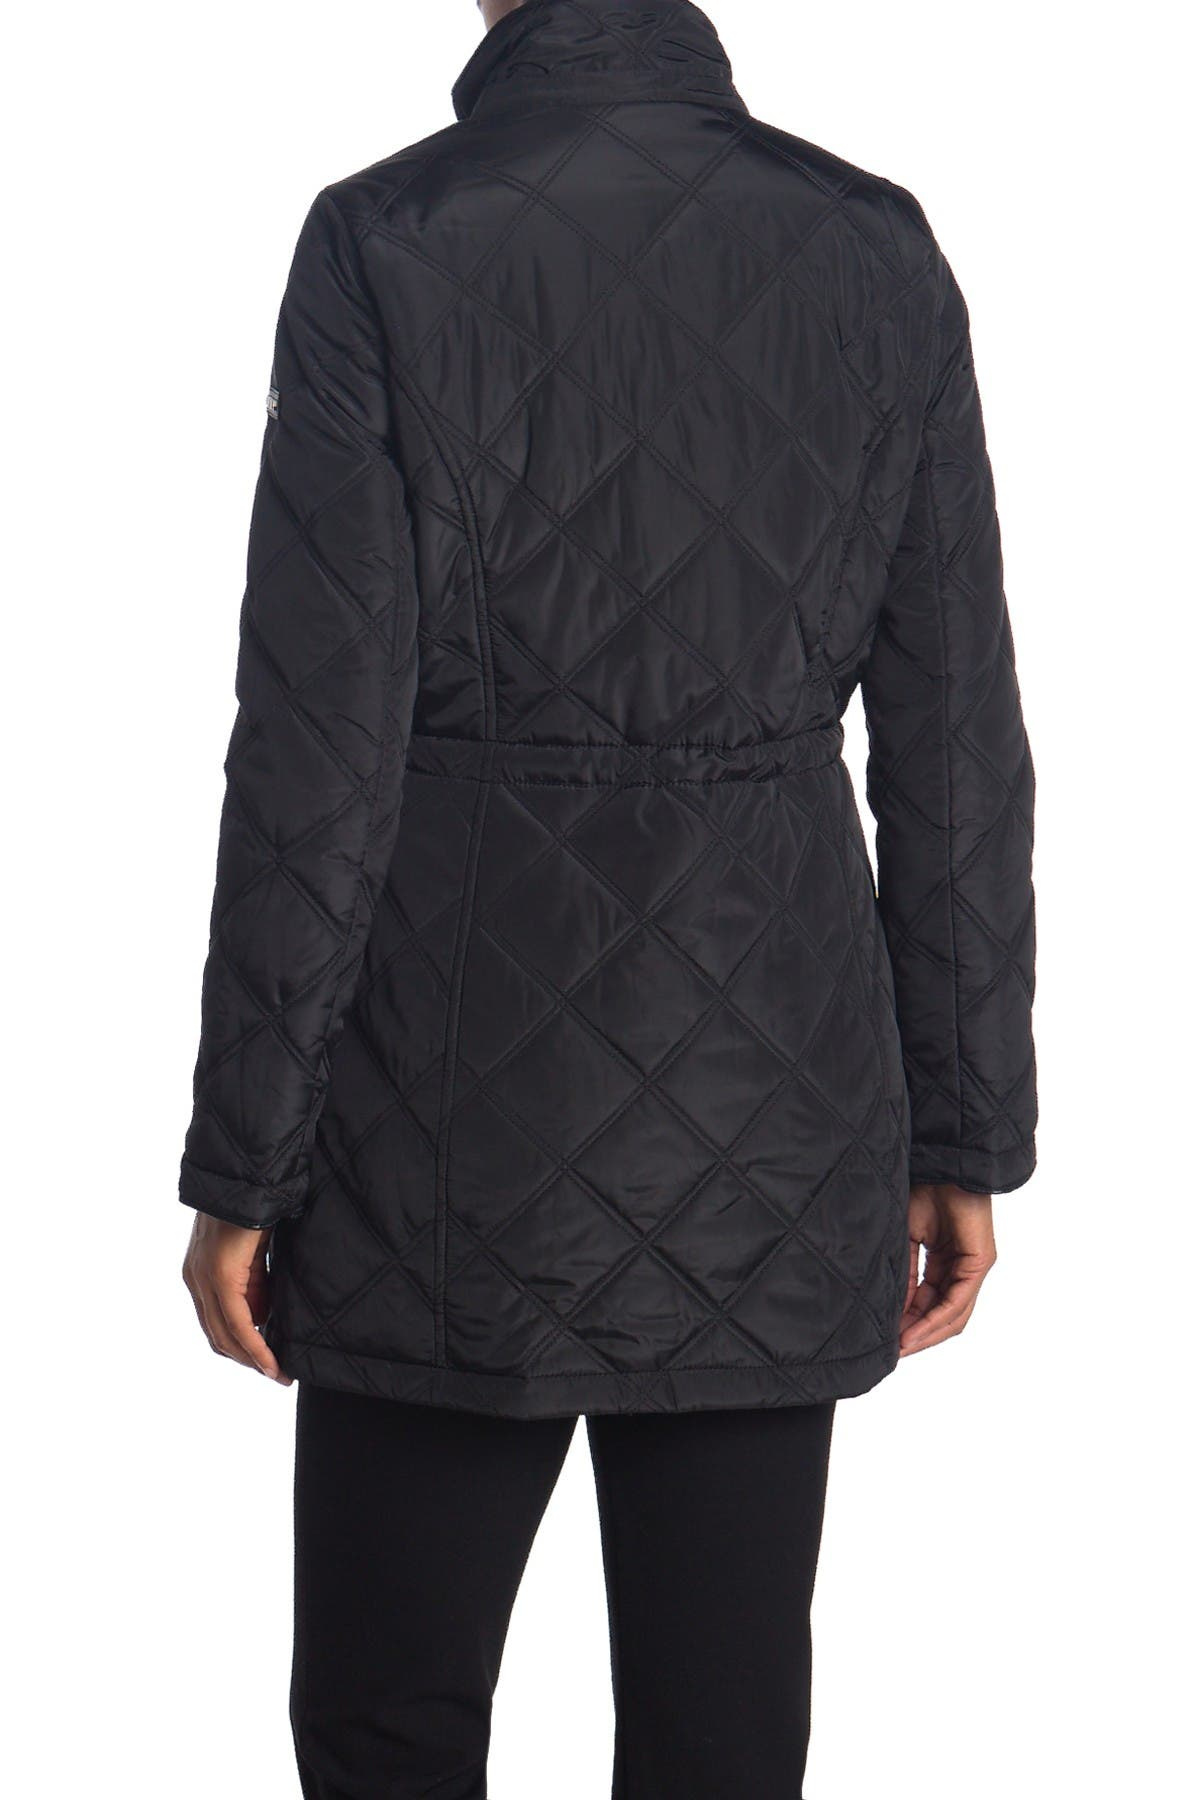 DKNY Cinch Waist Quilt Jacket with Hood